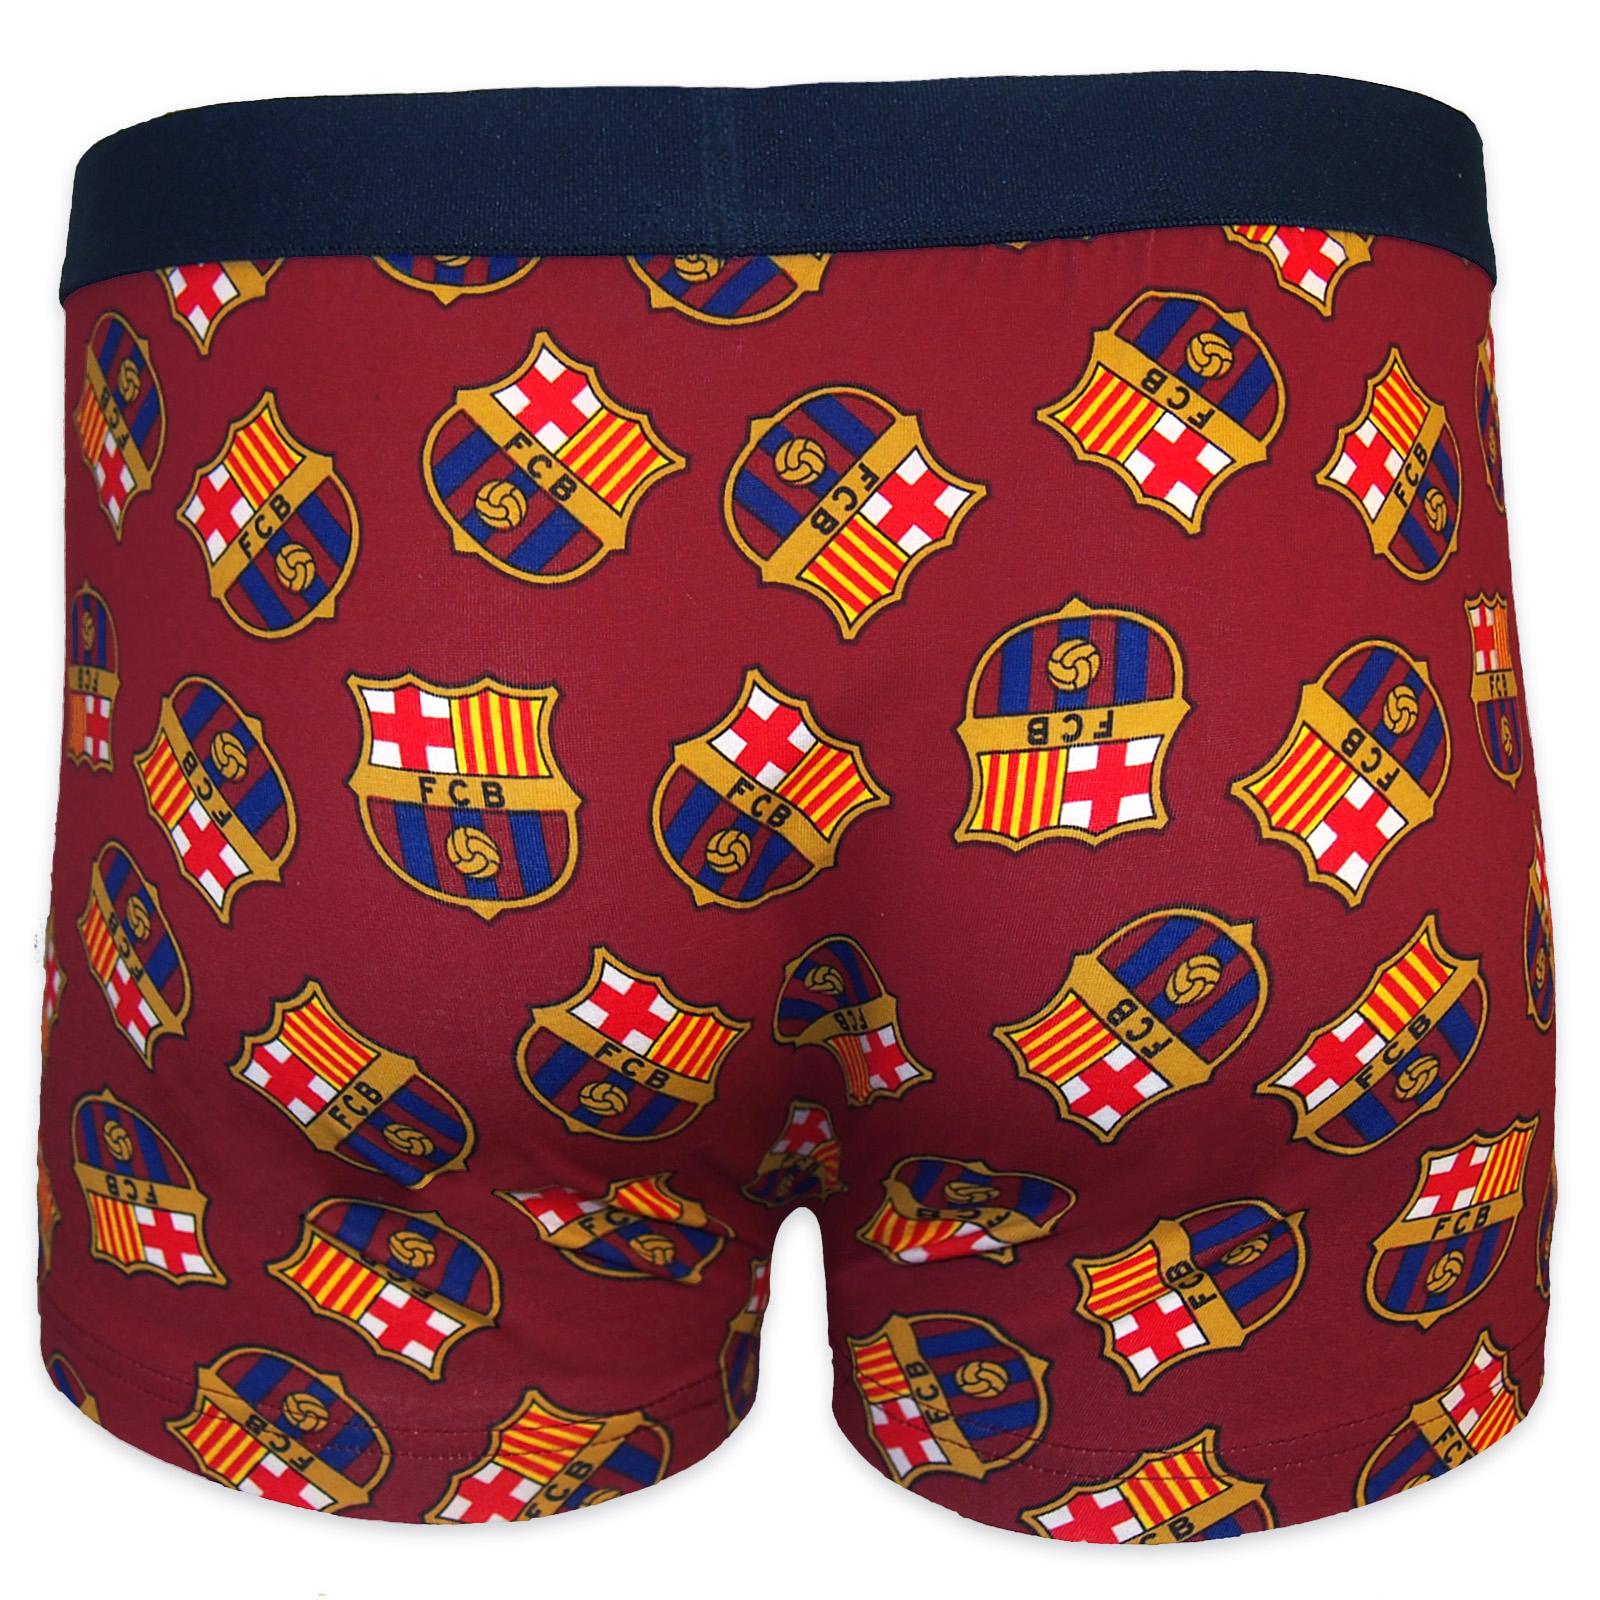 FC Barcelona Official Soccer Gift 1 Pack Mens Crest Boxer ...